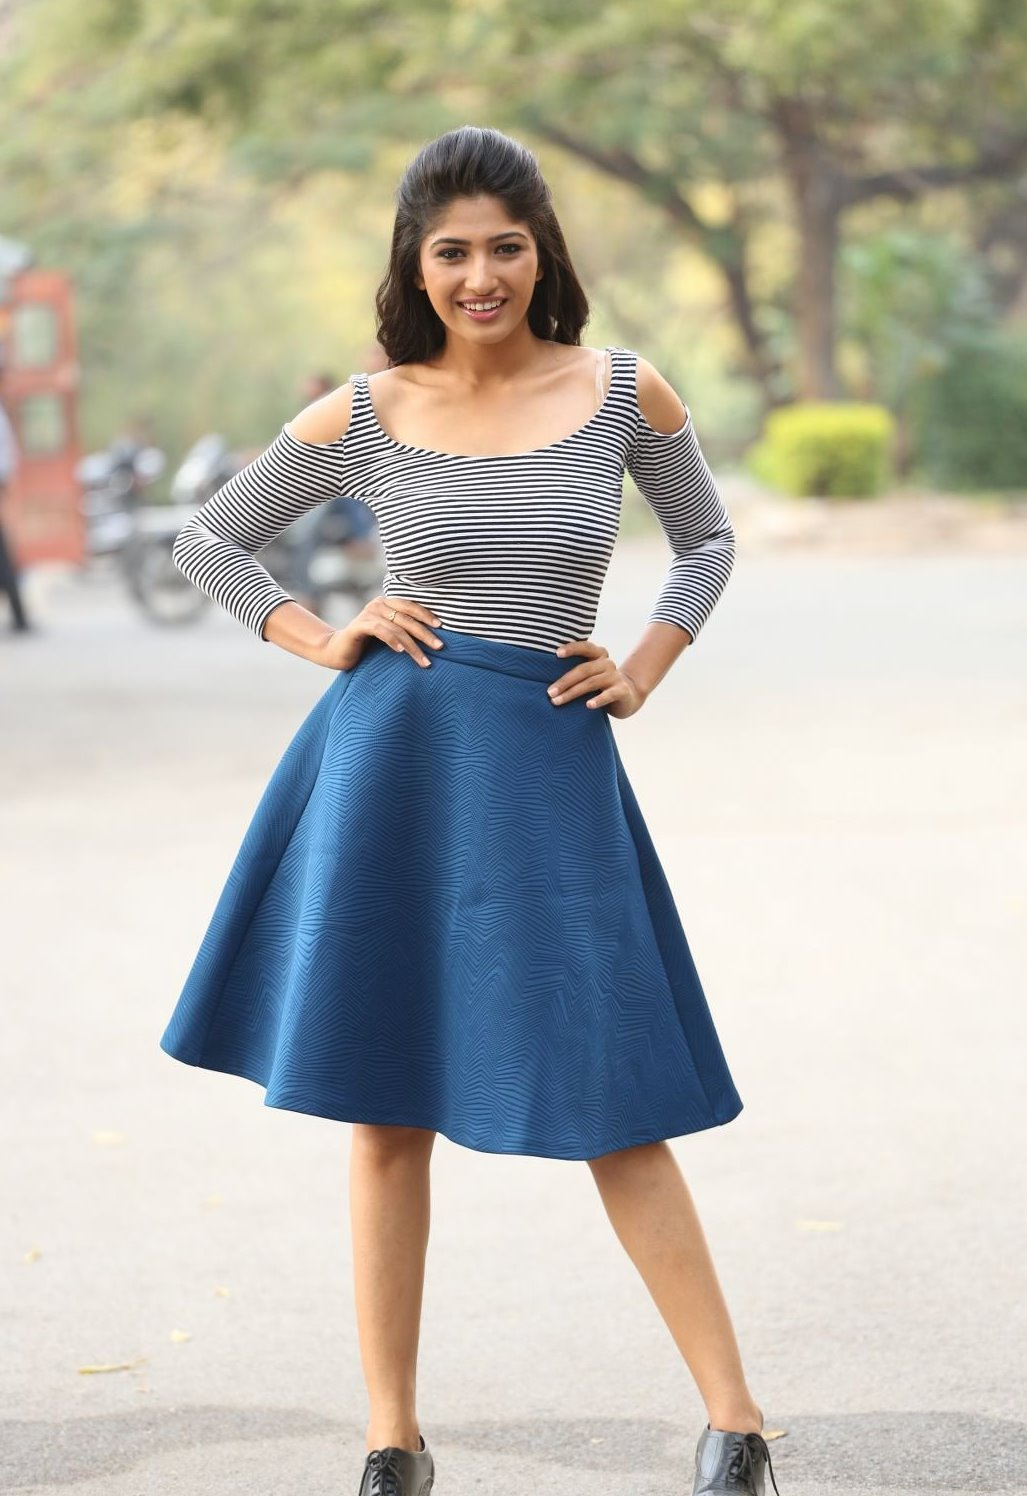 Indian Girl Roshini Prakash Stills In Blue Dress